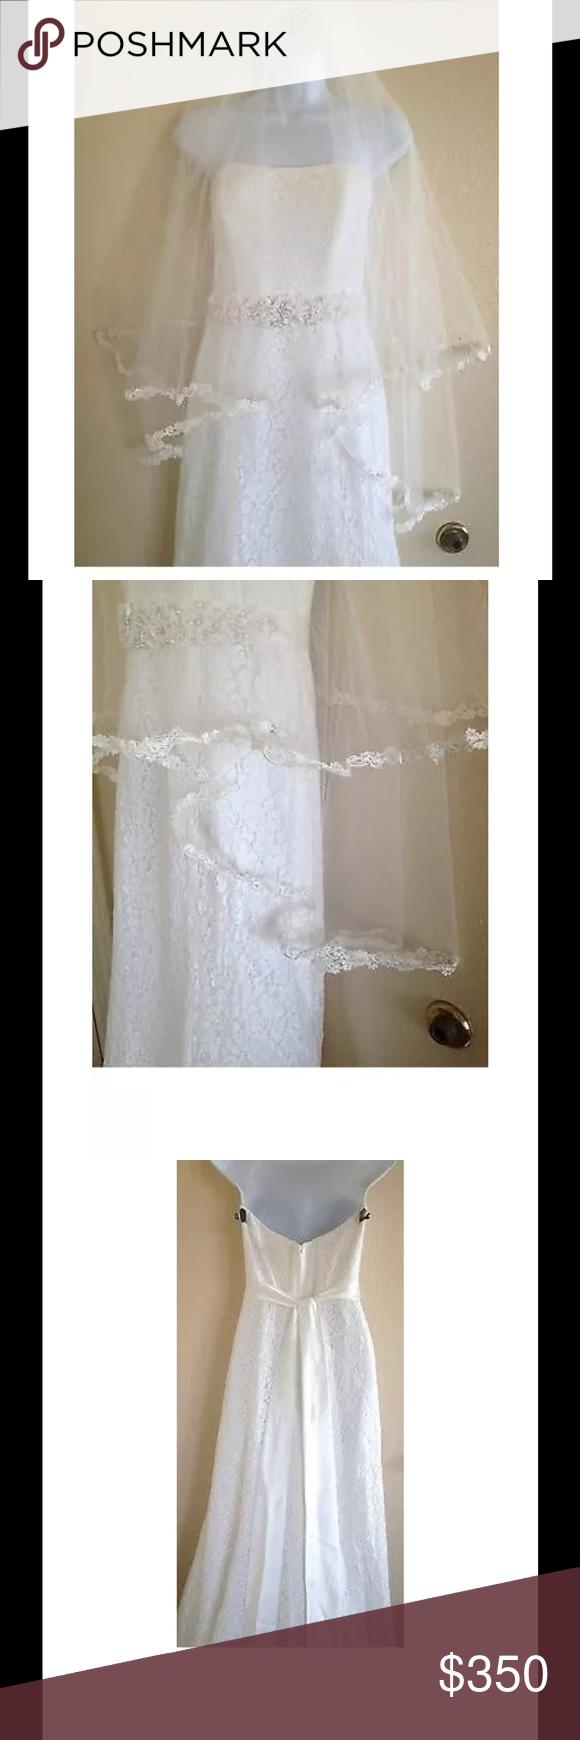 Davids Bridal Wedding Gown & Veil Davids bridal wedding